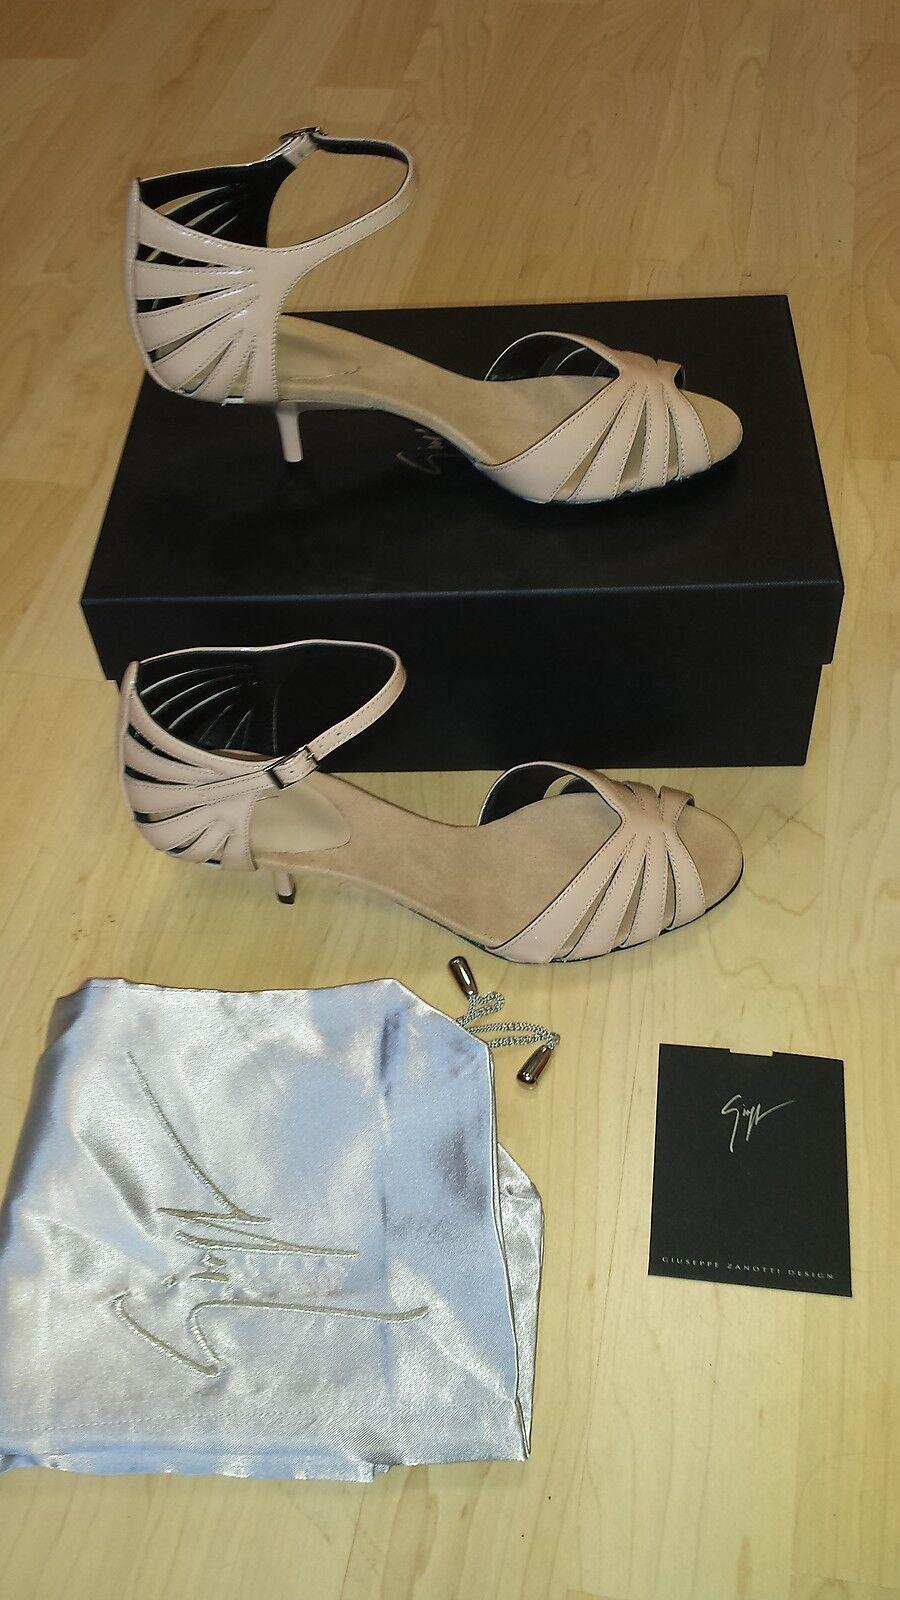 Authentique sandale à talon Giuseppe Zanotti Design E30219 valeur  *NEUF*